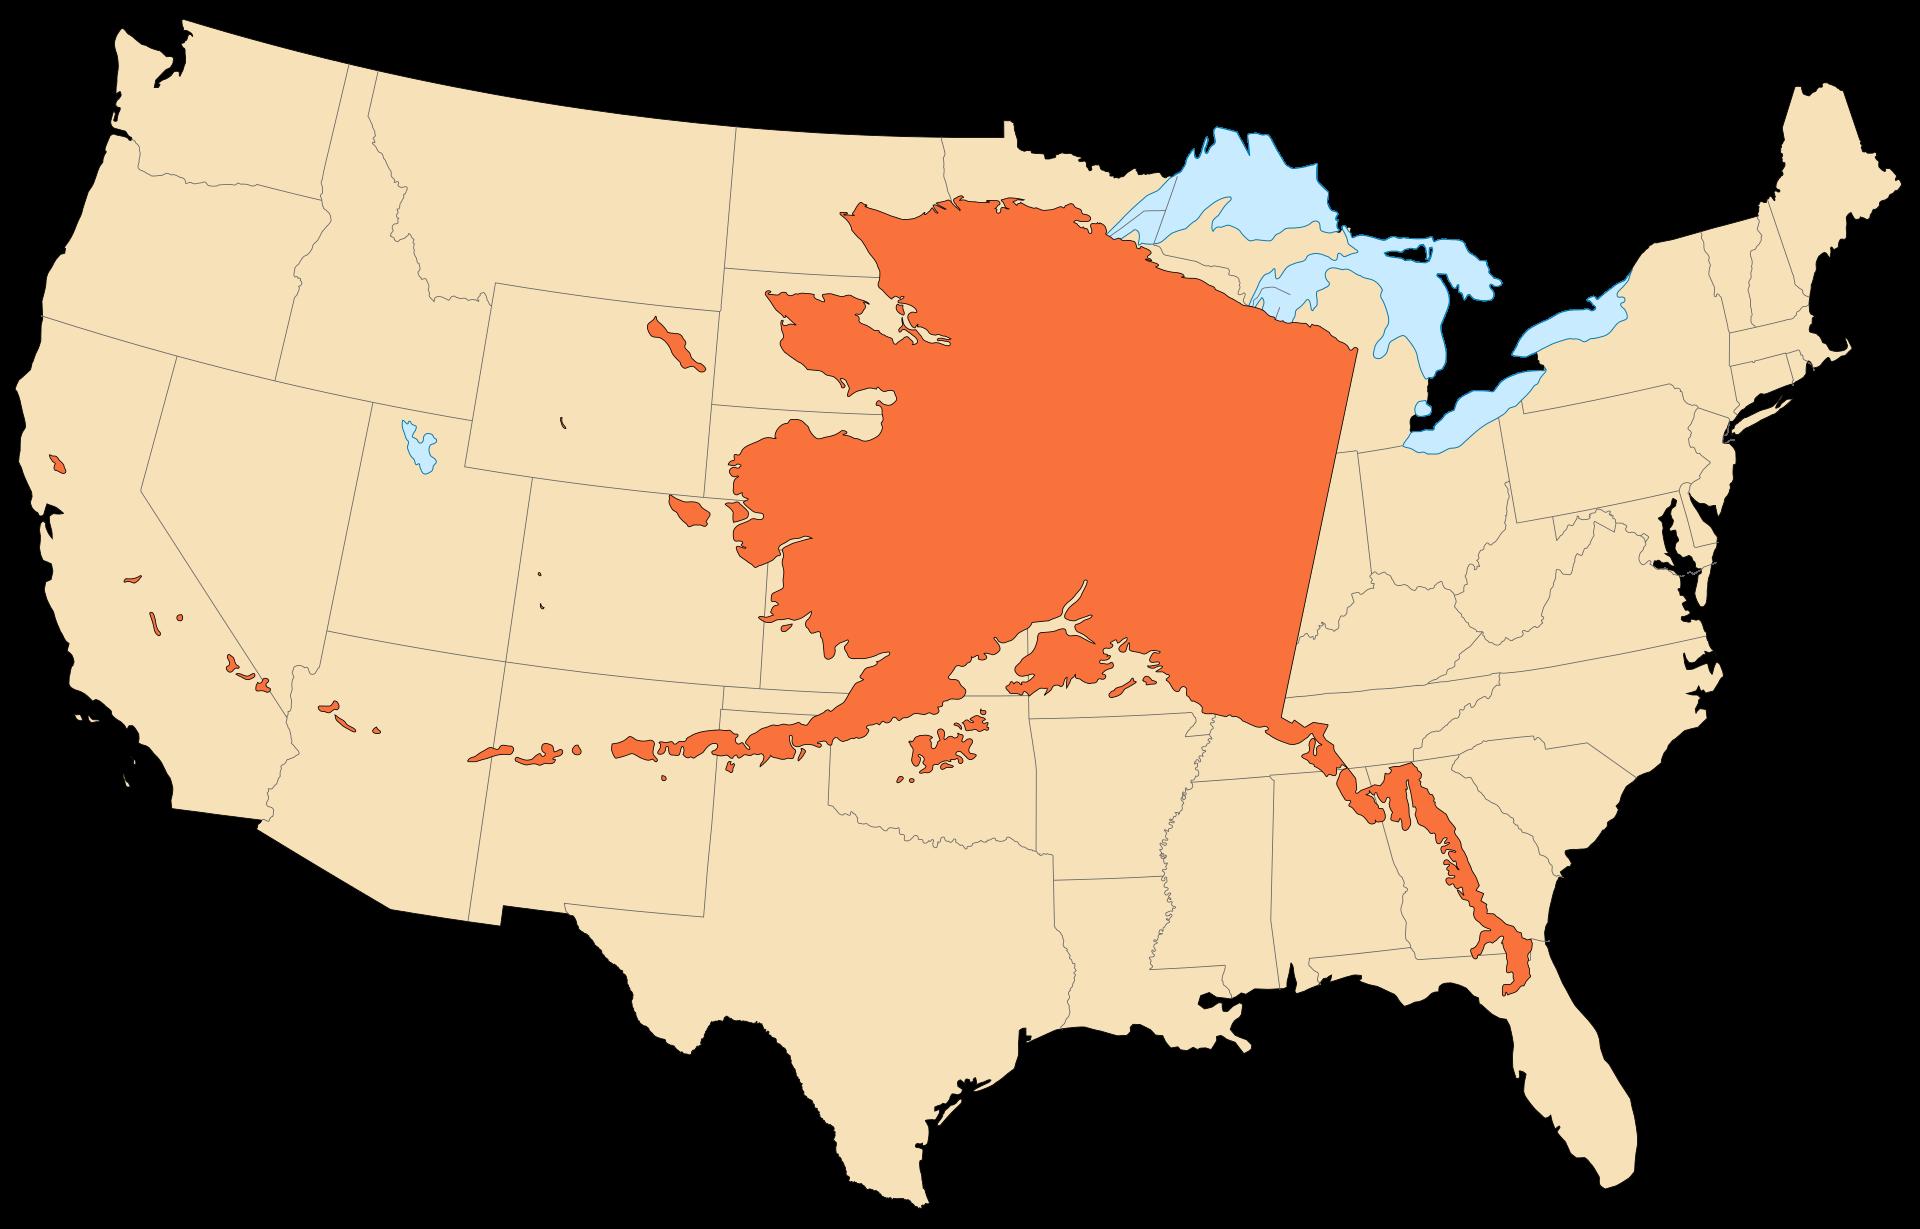 Alaska Overlay On Us Map Alaska superimposed over continental US | World map continents